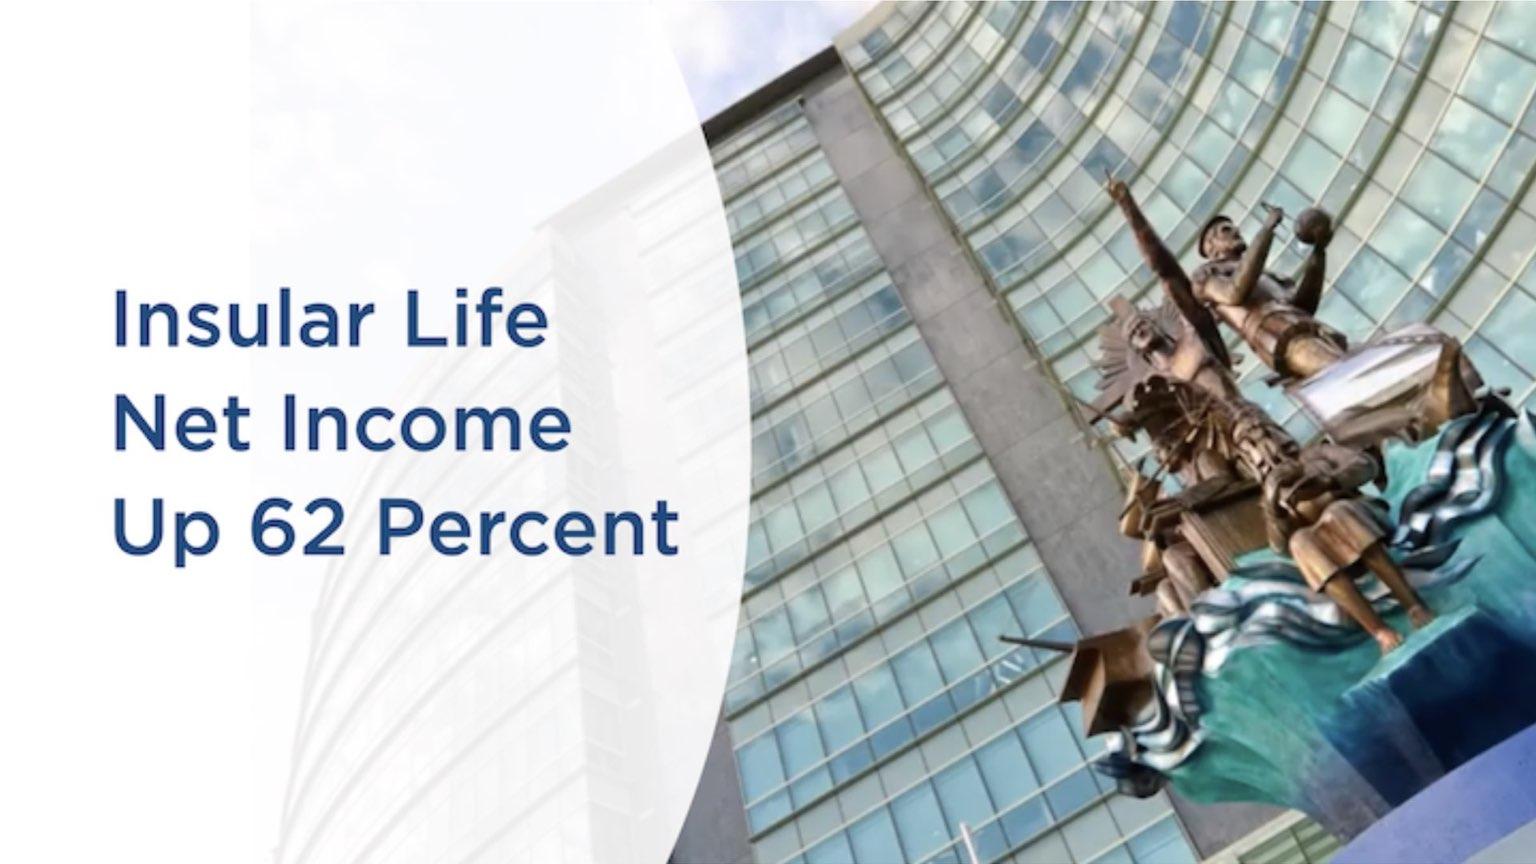 Insular Life 2019 Net income Soars 62 Percent